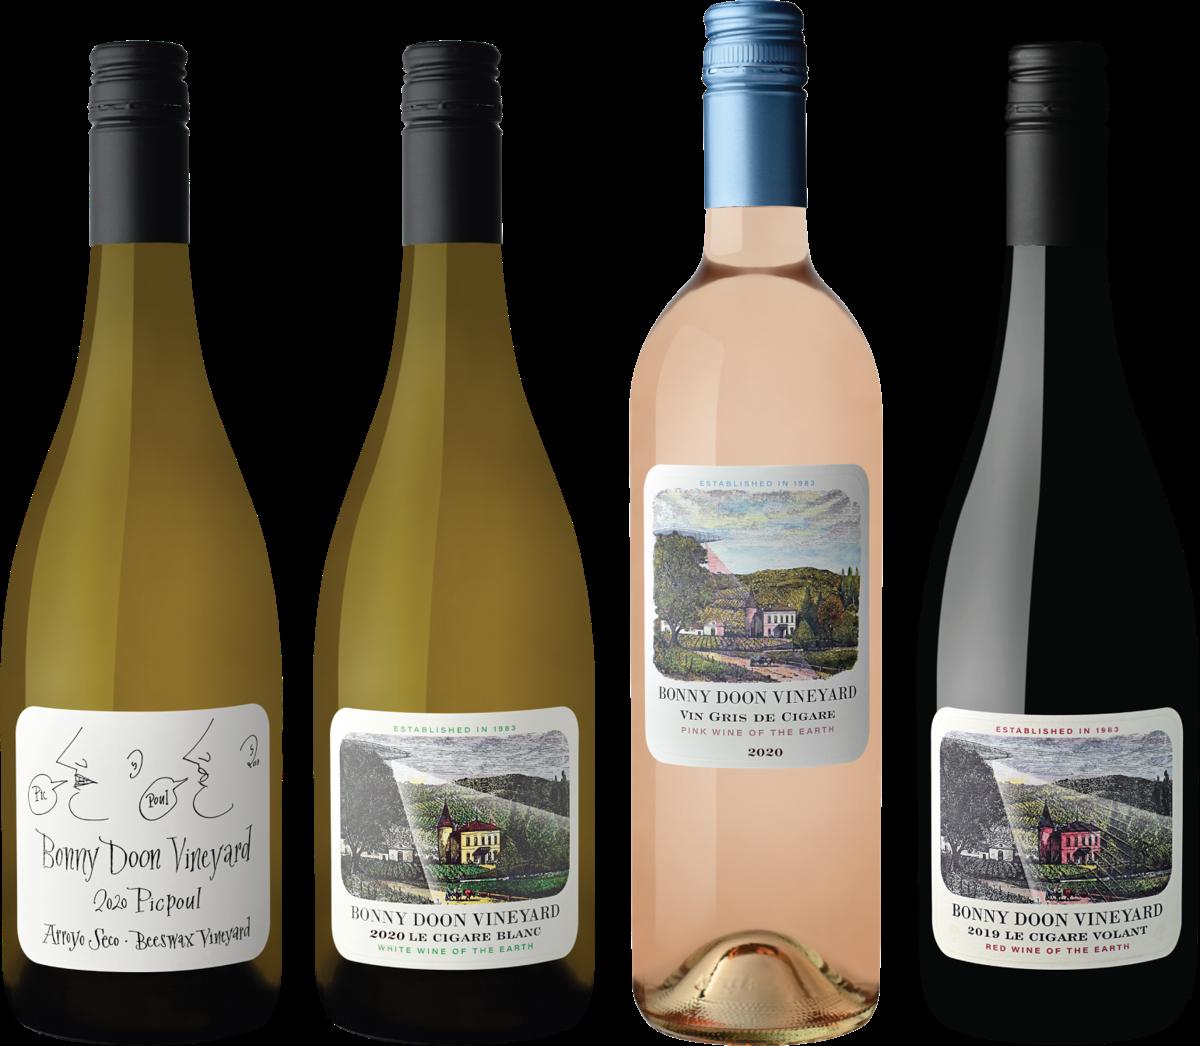 Bonny Doon Vineyards